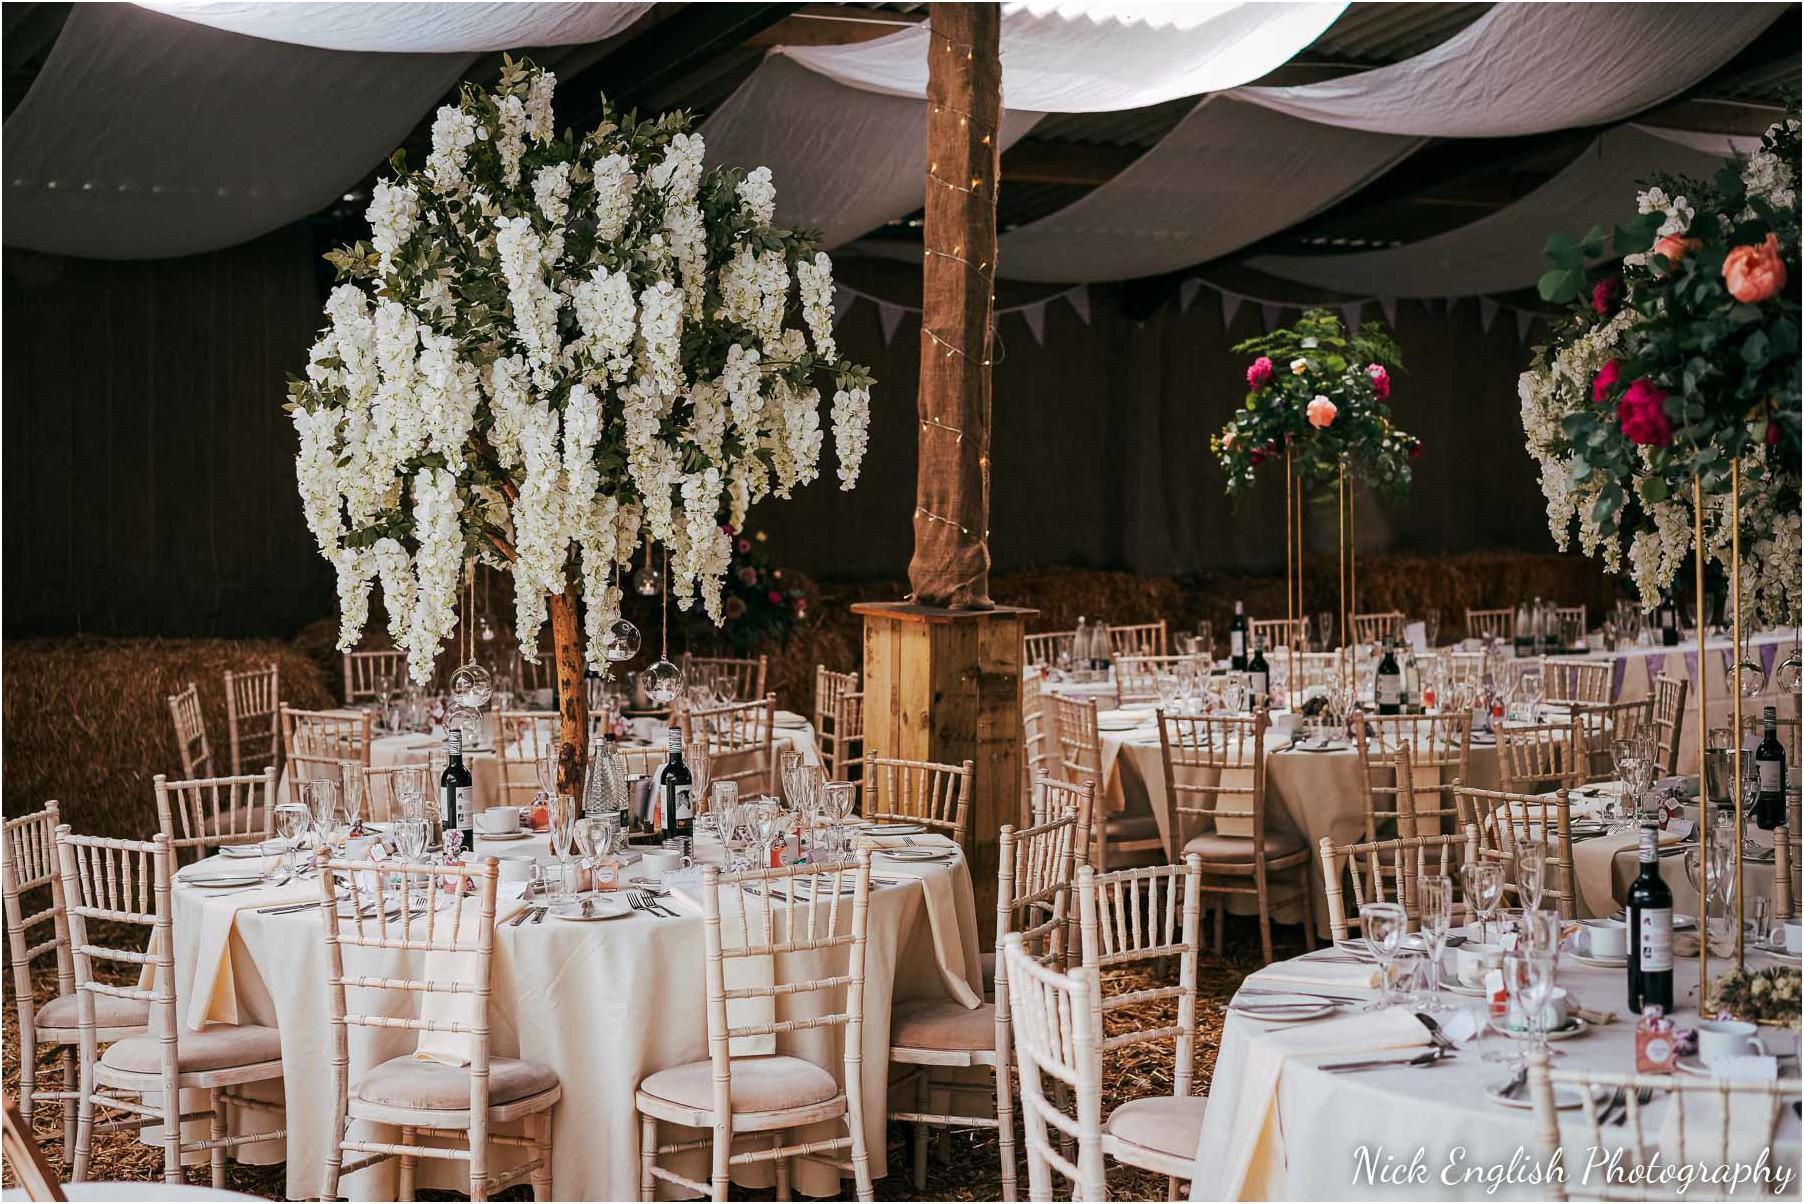 Whitebottom_Farm_Wedding_Manchester_Photograph-49.jpg